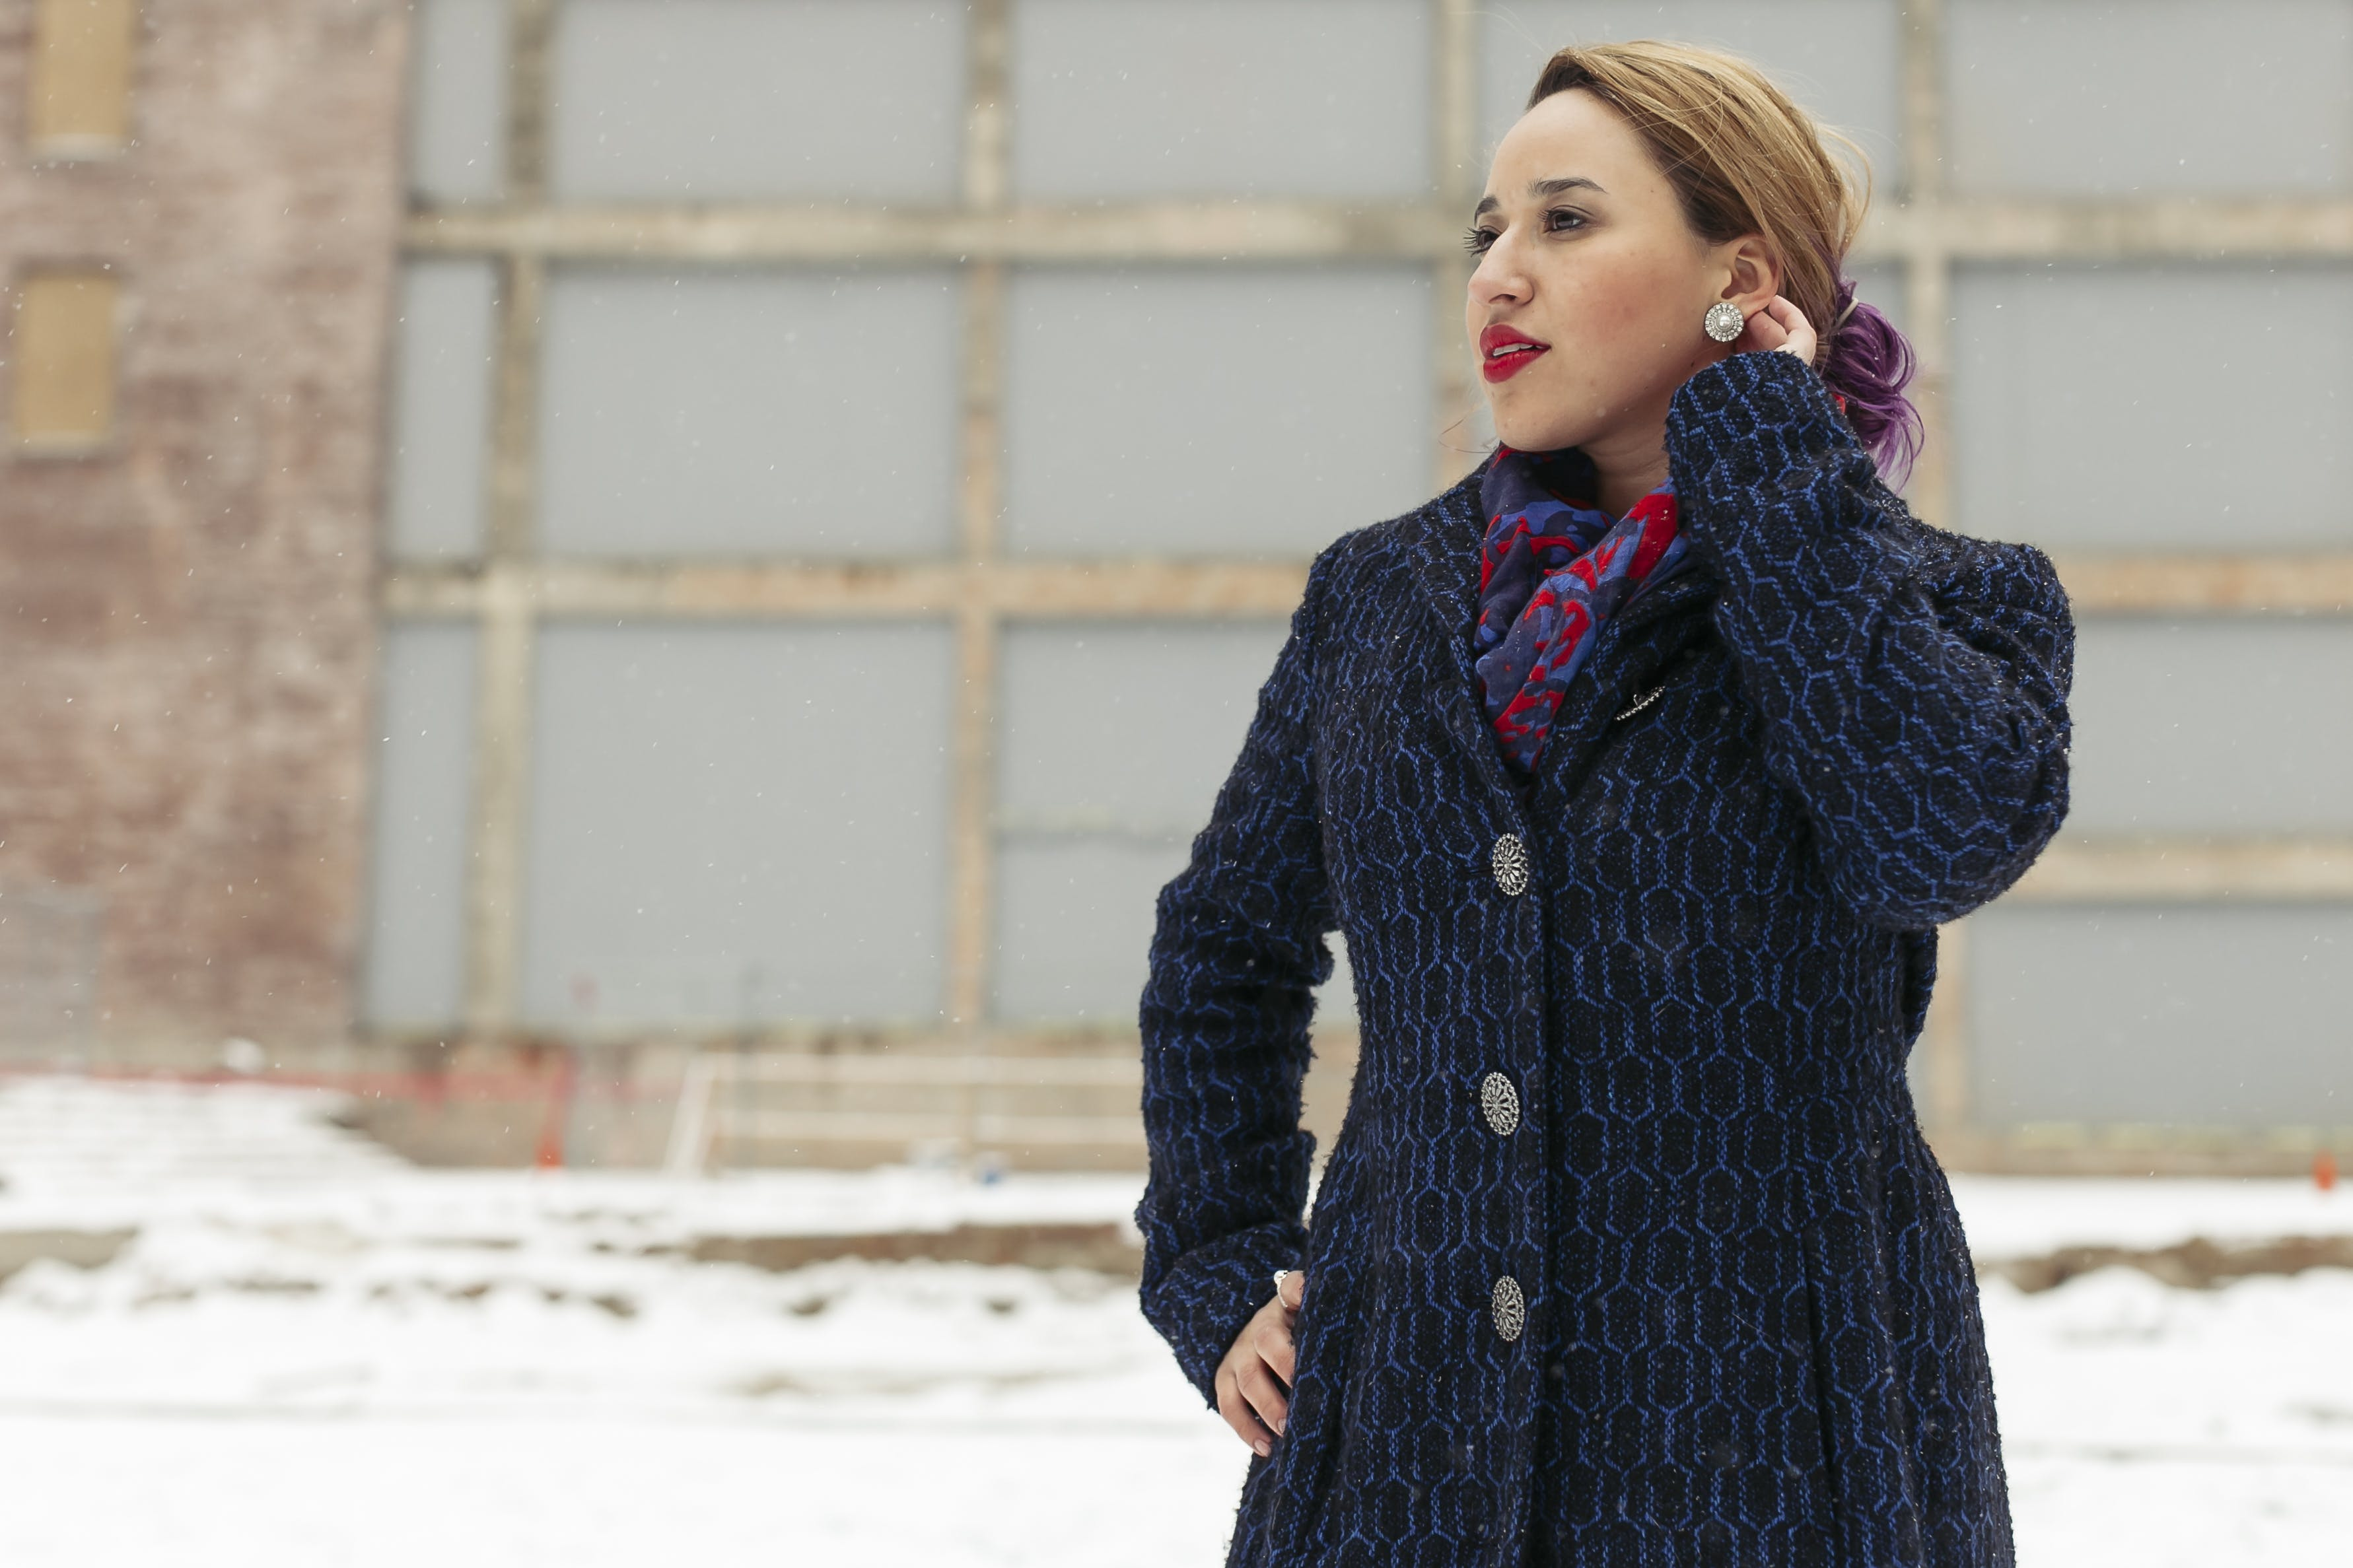 Free stock photo of beautiful, city, coat, cold